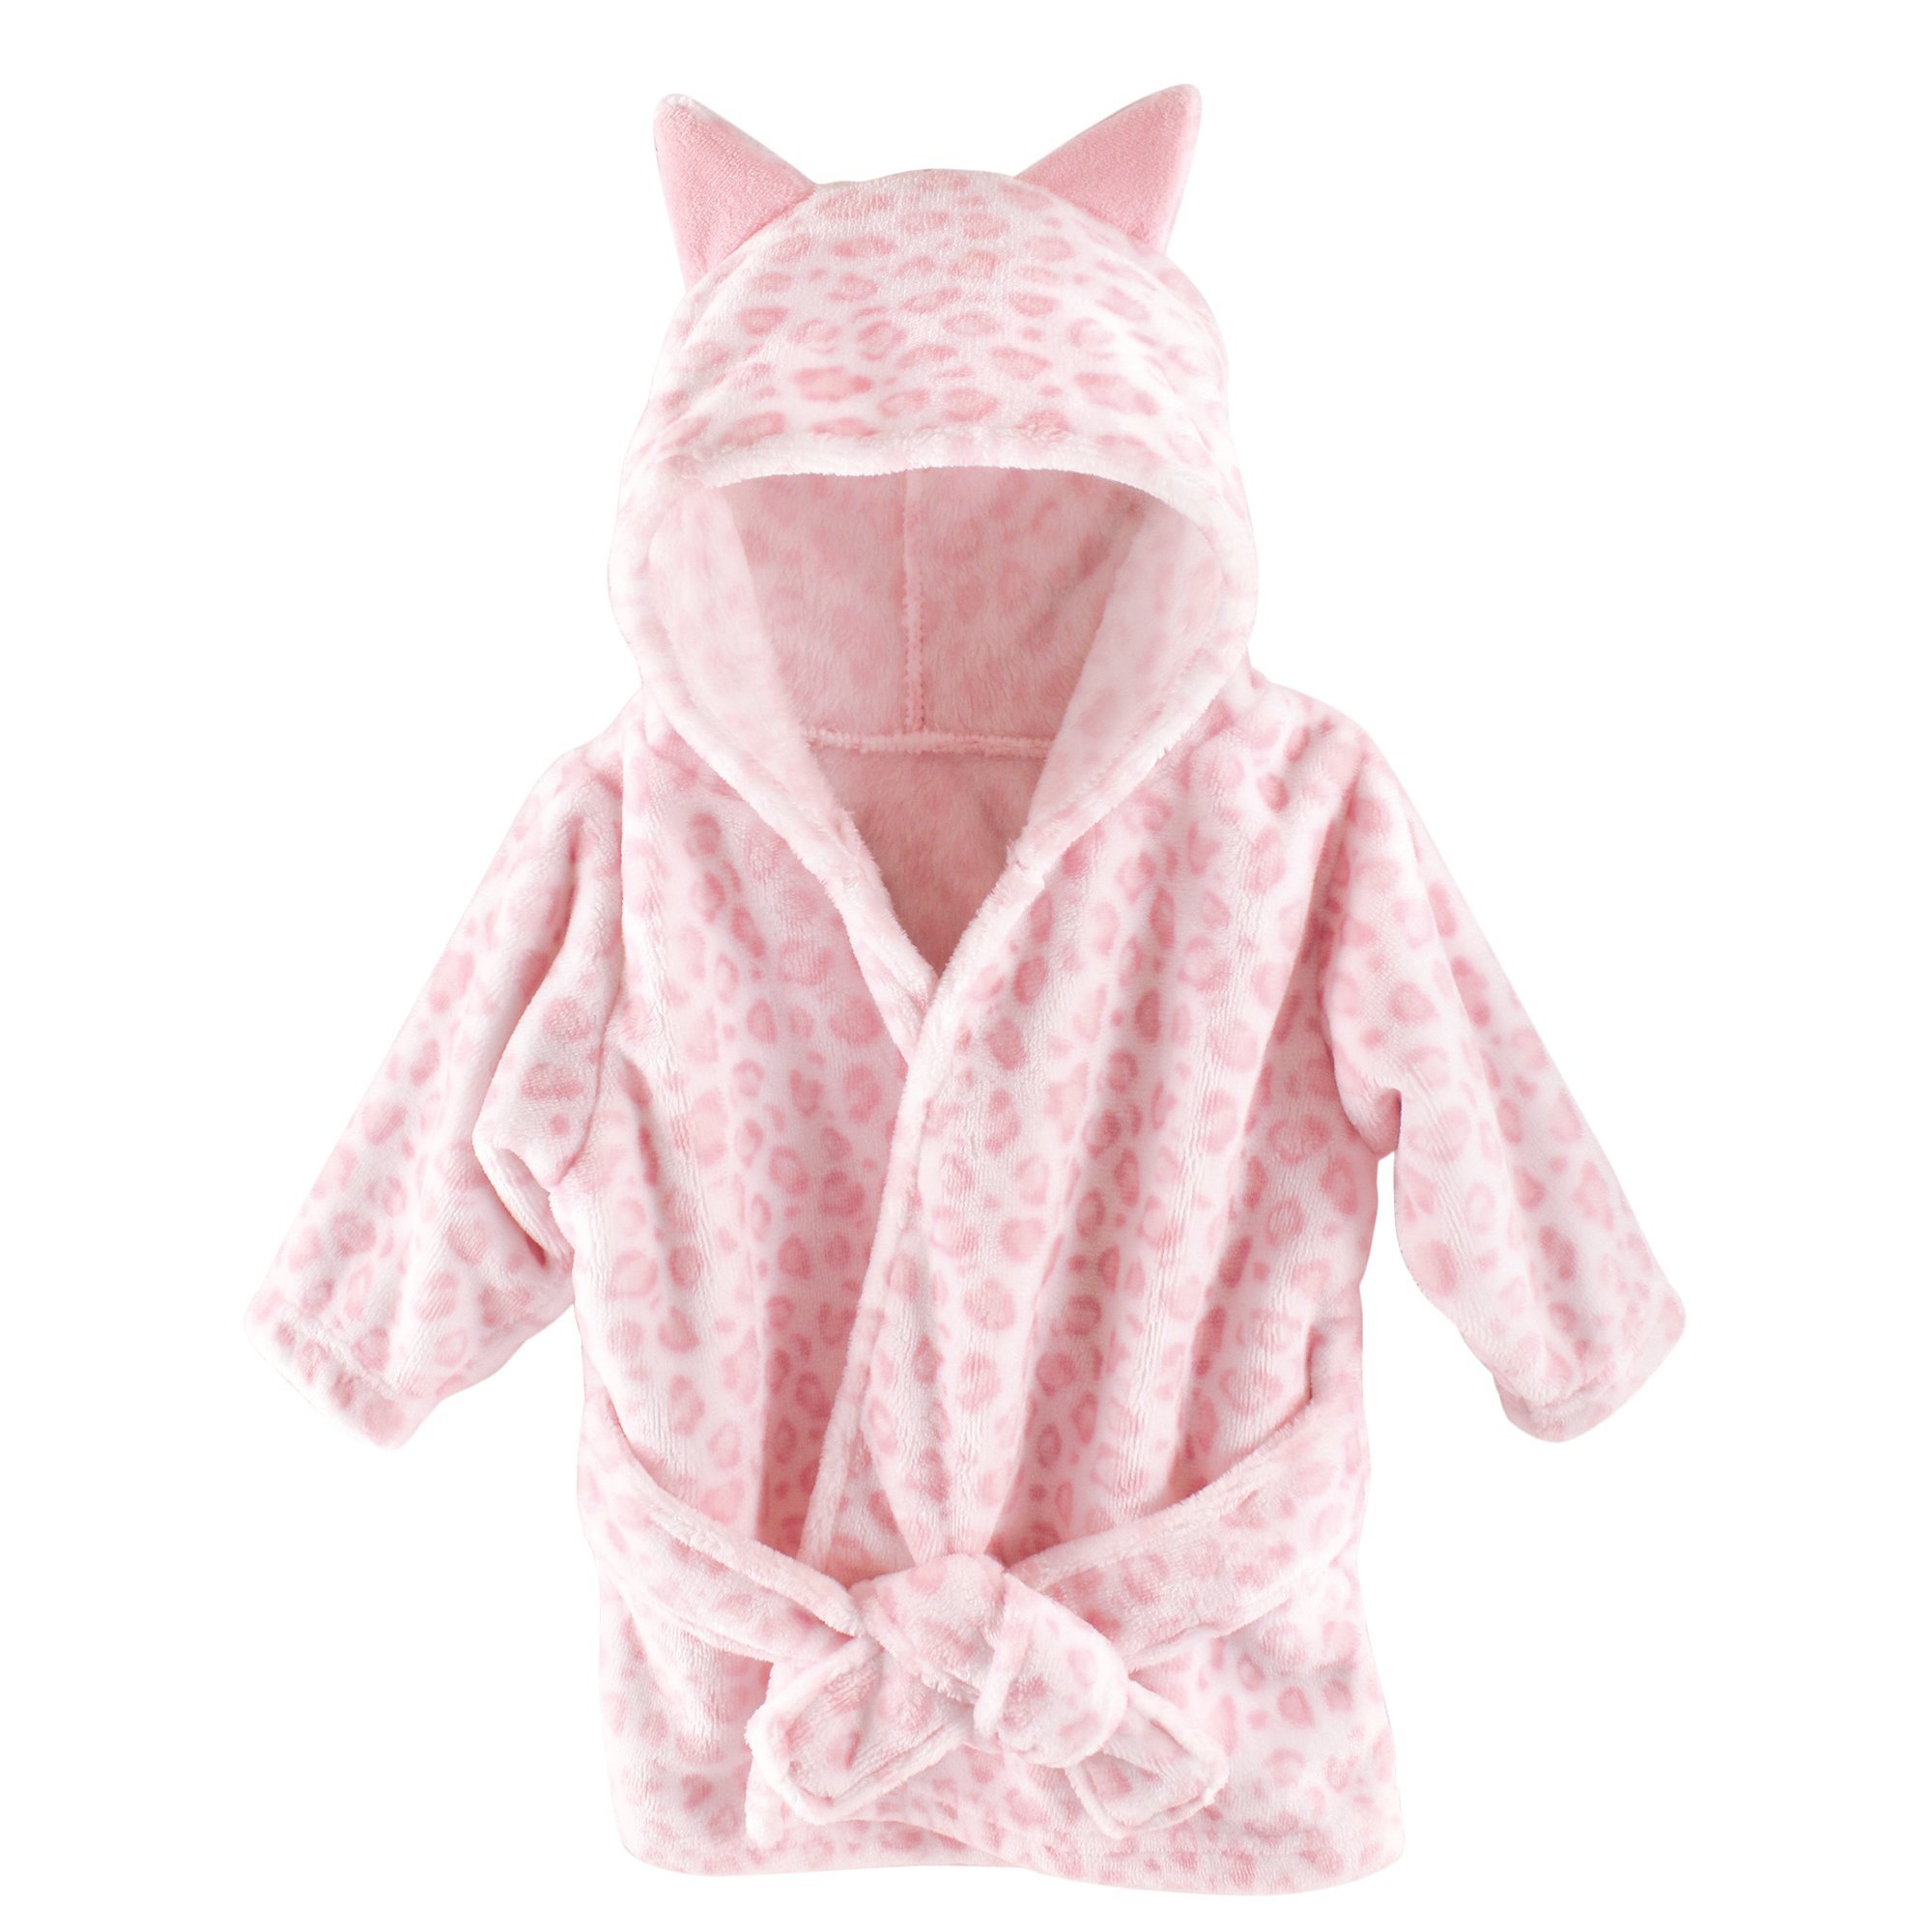 6caf95ca2823 Amazon.com  Hudson Baby Plush Bathrobe